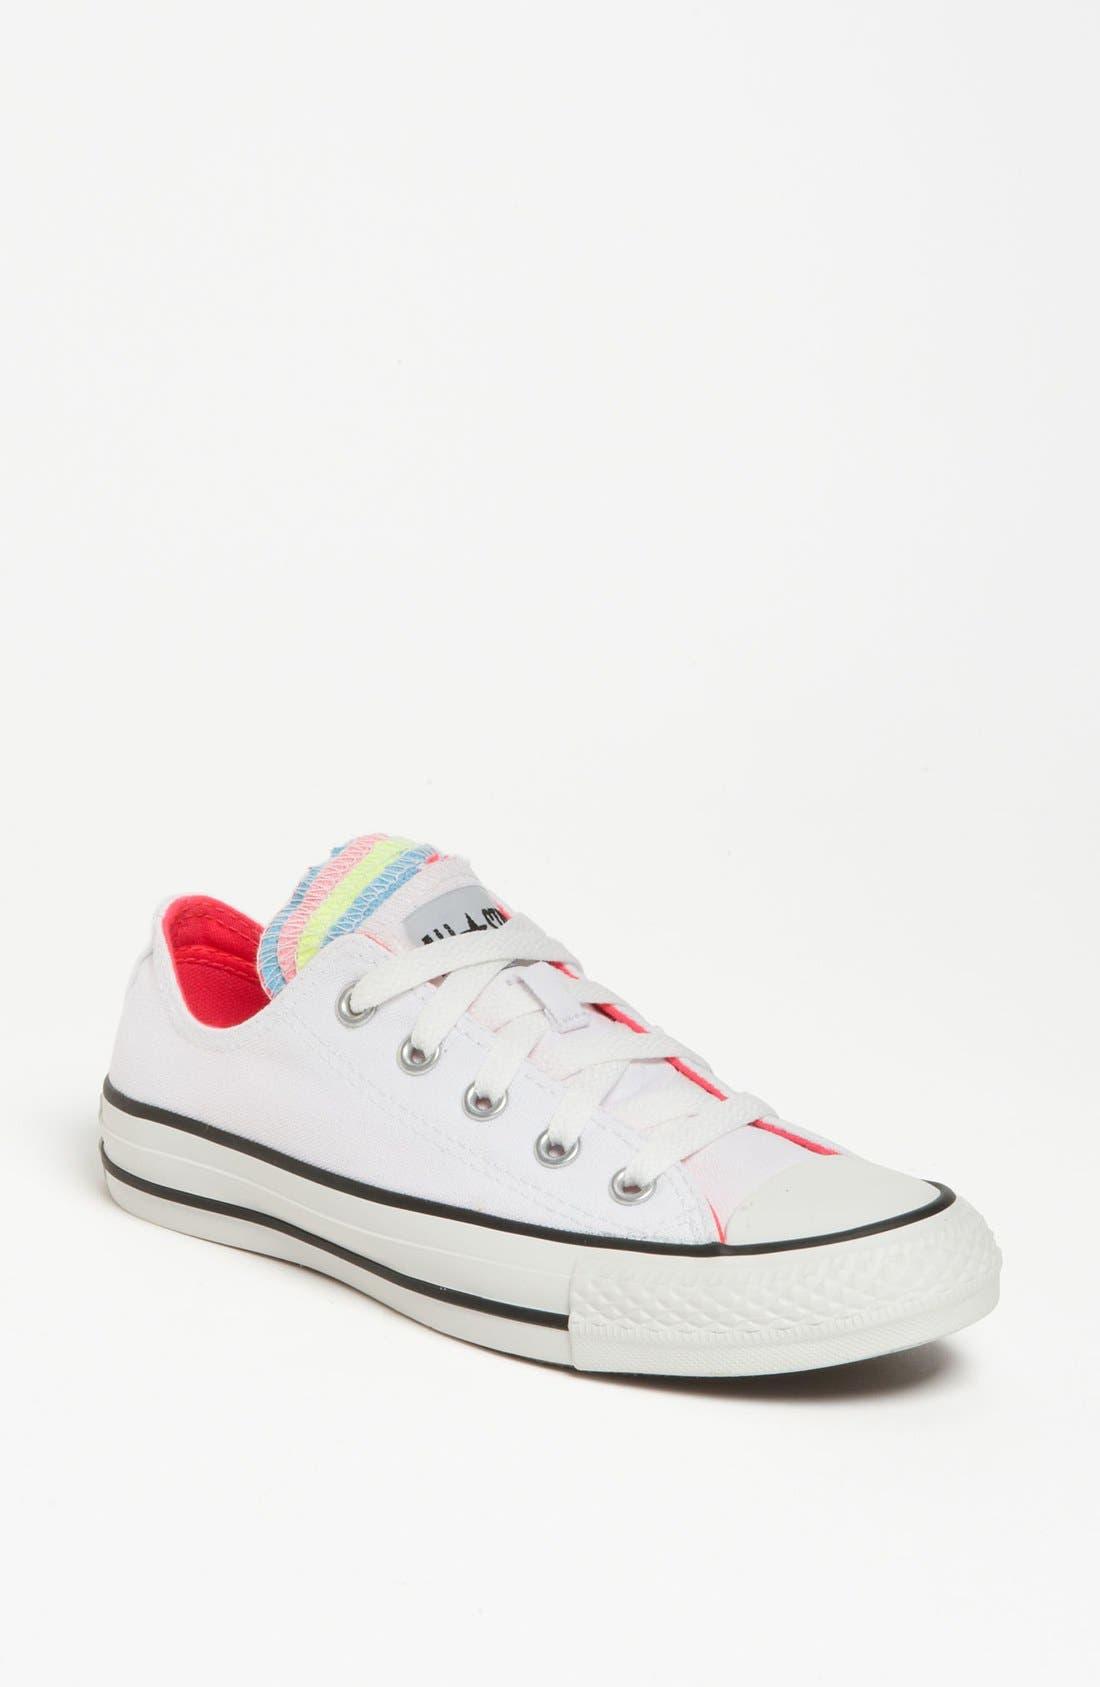 Main Image - Converse Chuck Taylor® All Star® Multi Tongue Sneaker